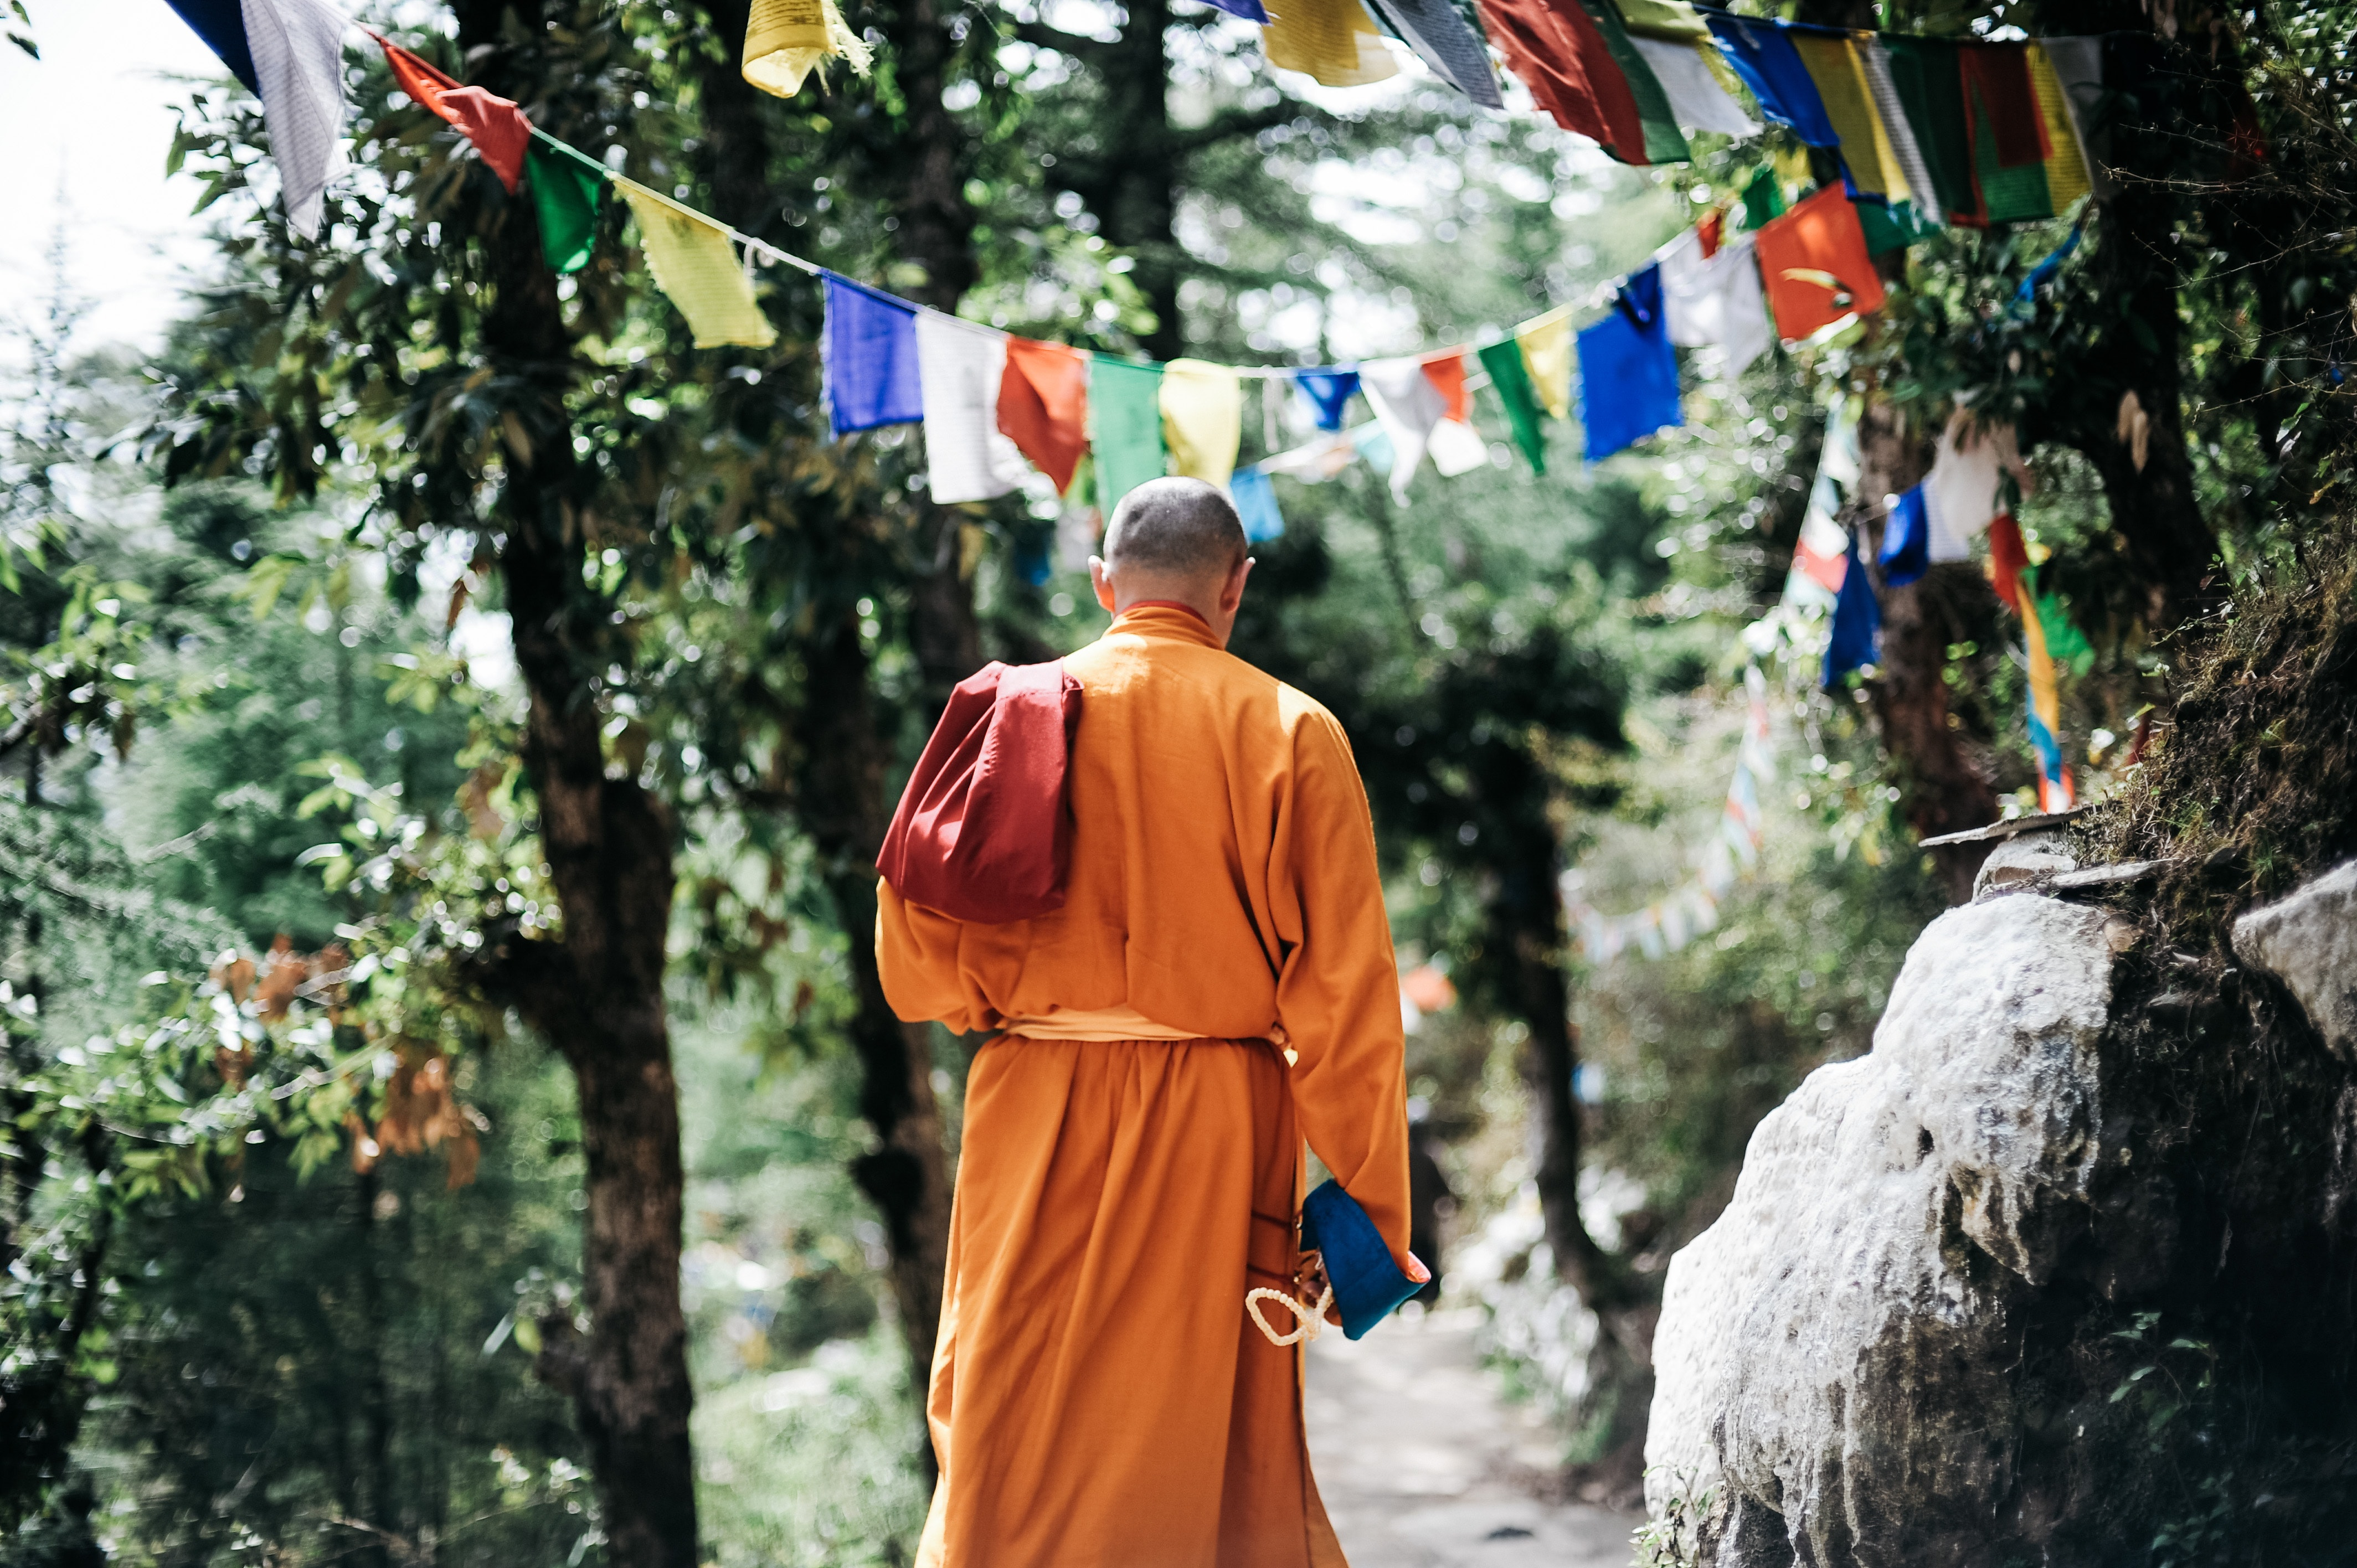 Monk walking near buntings during day photo